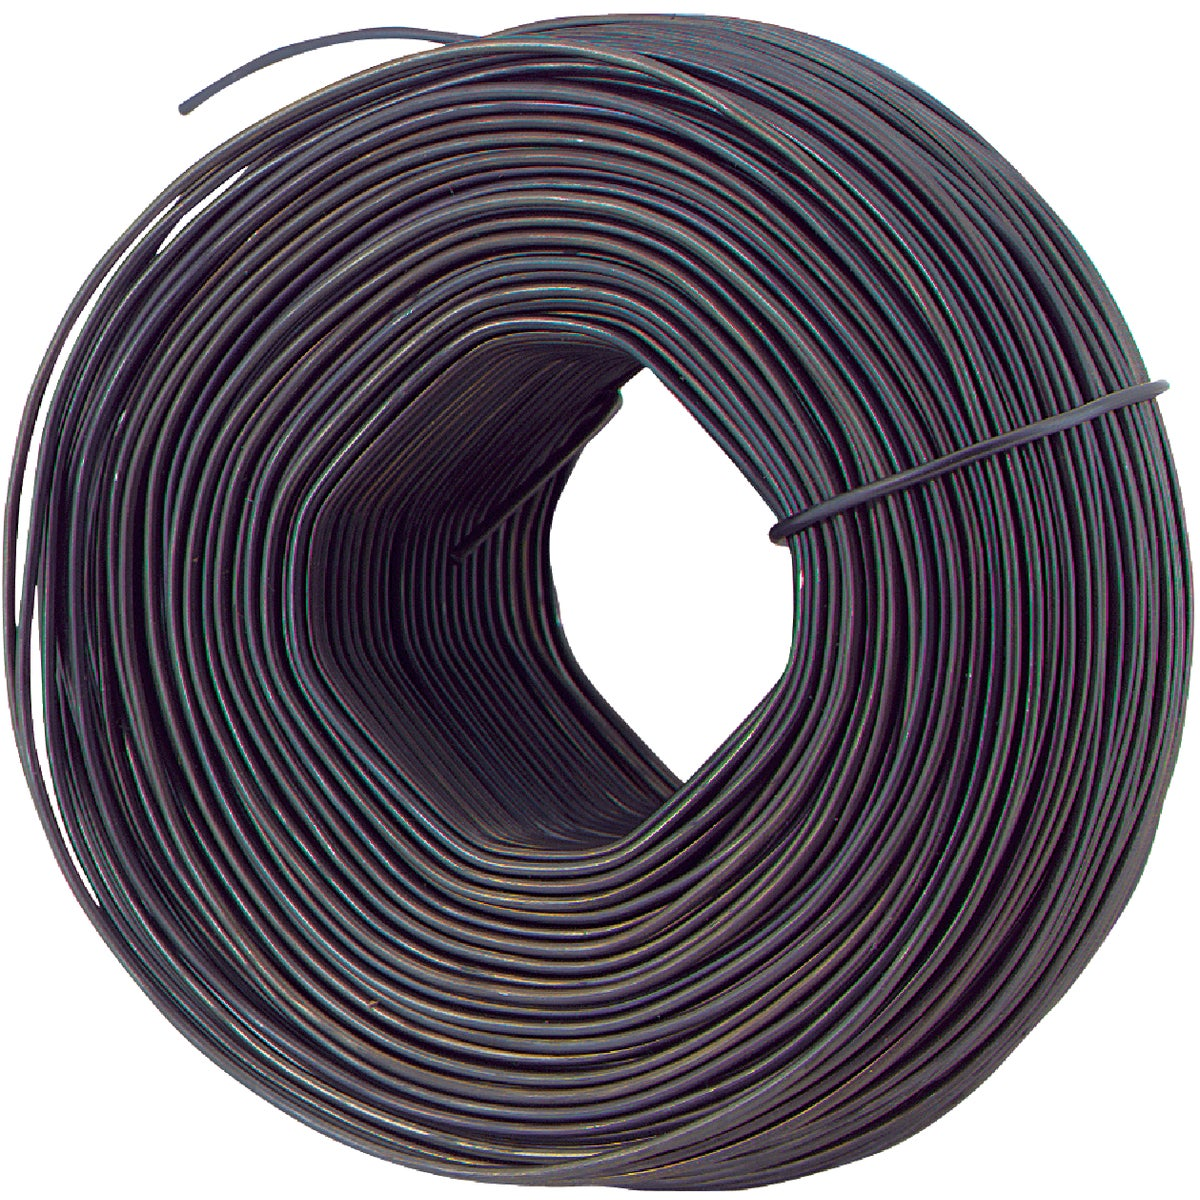 3.5Lb 16.5Ga Tie Wire